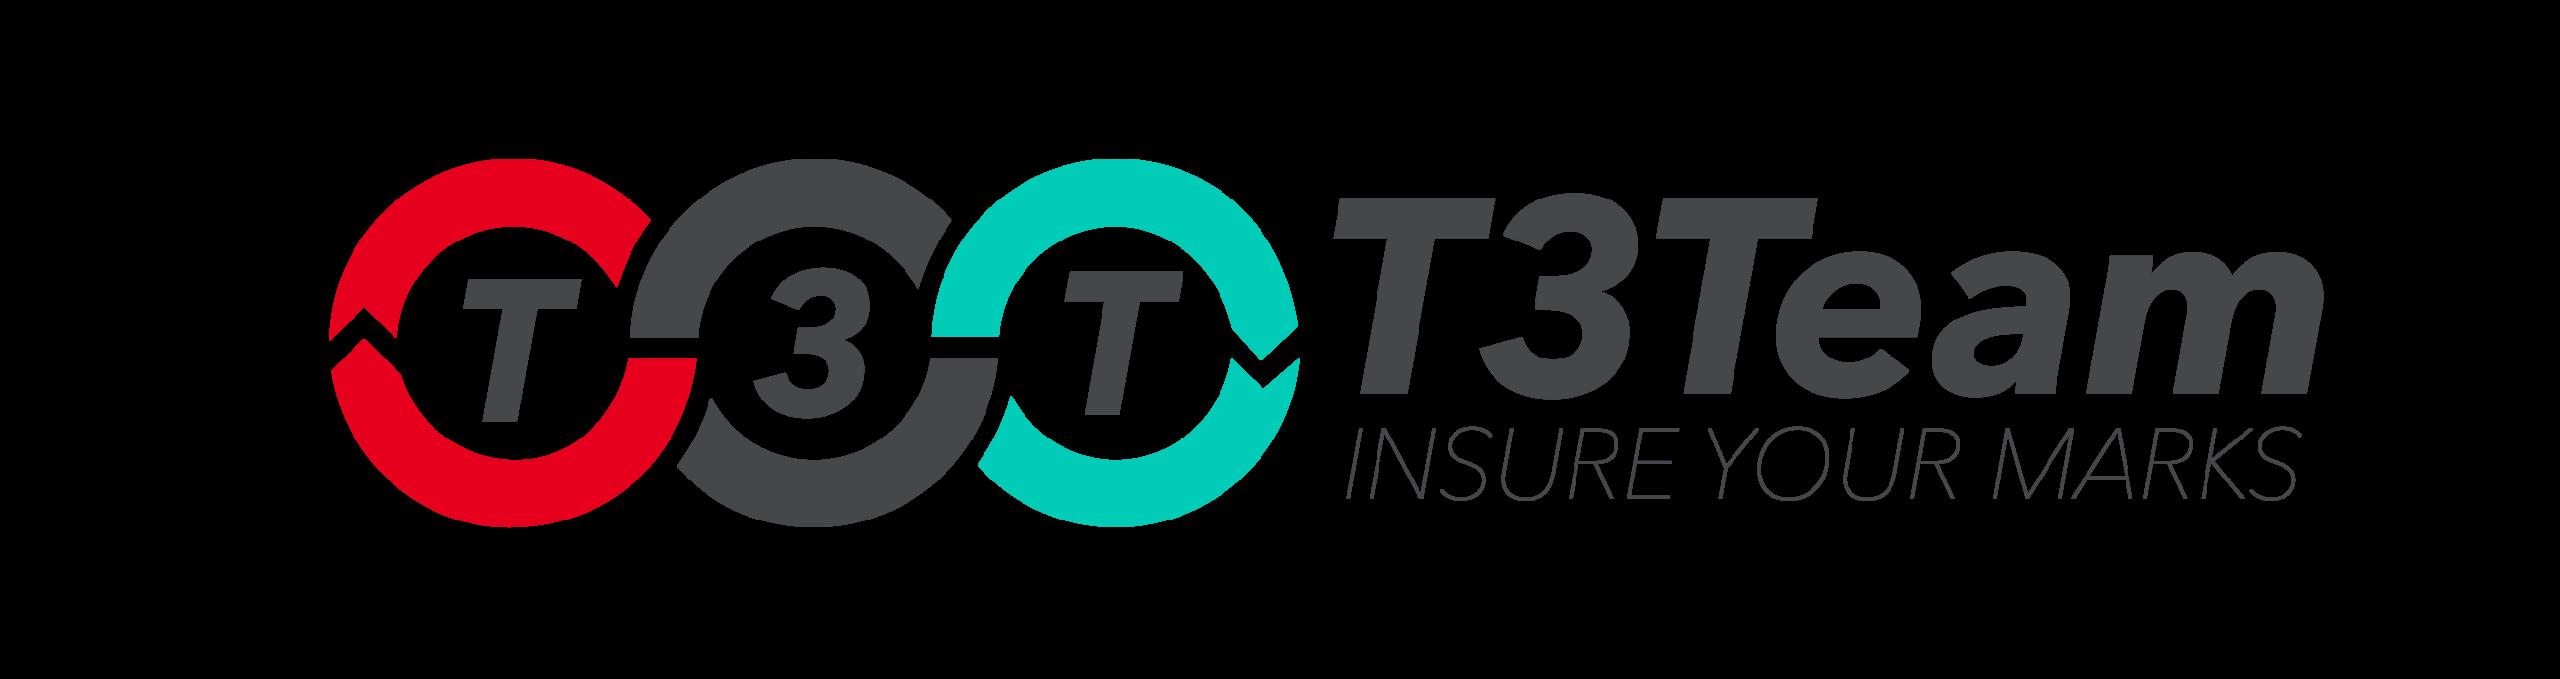 T3 Team Club logo